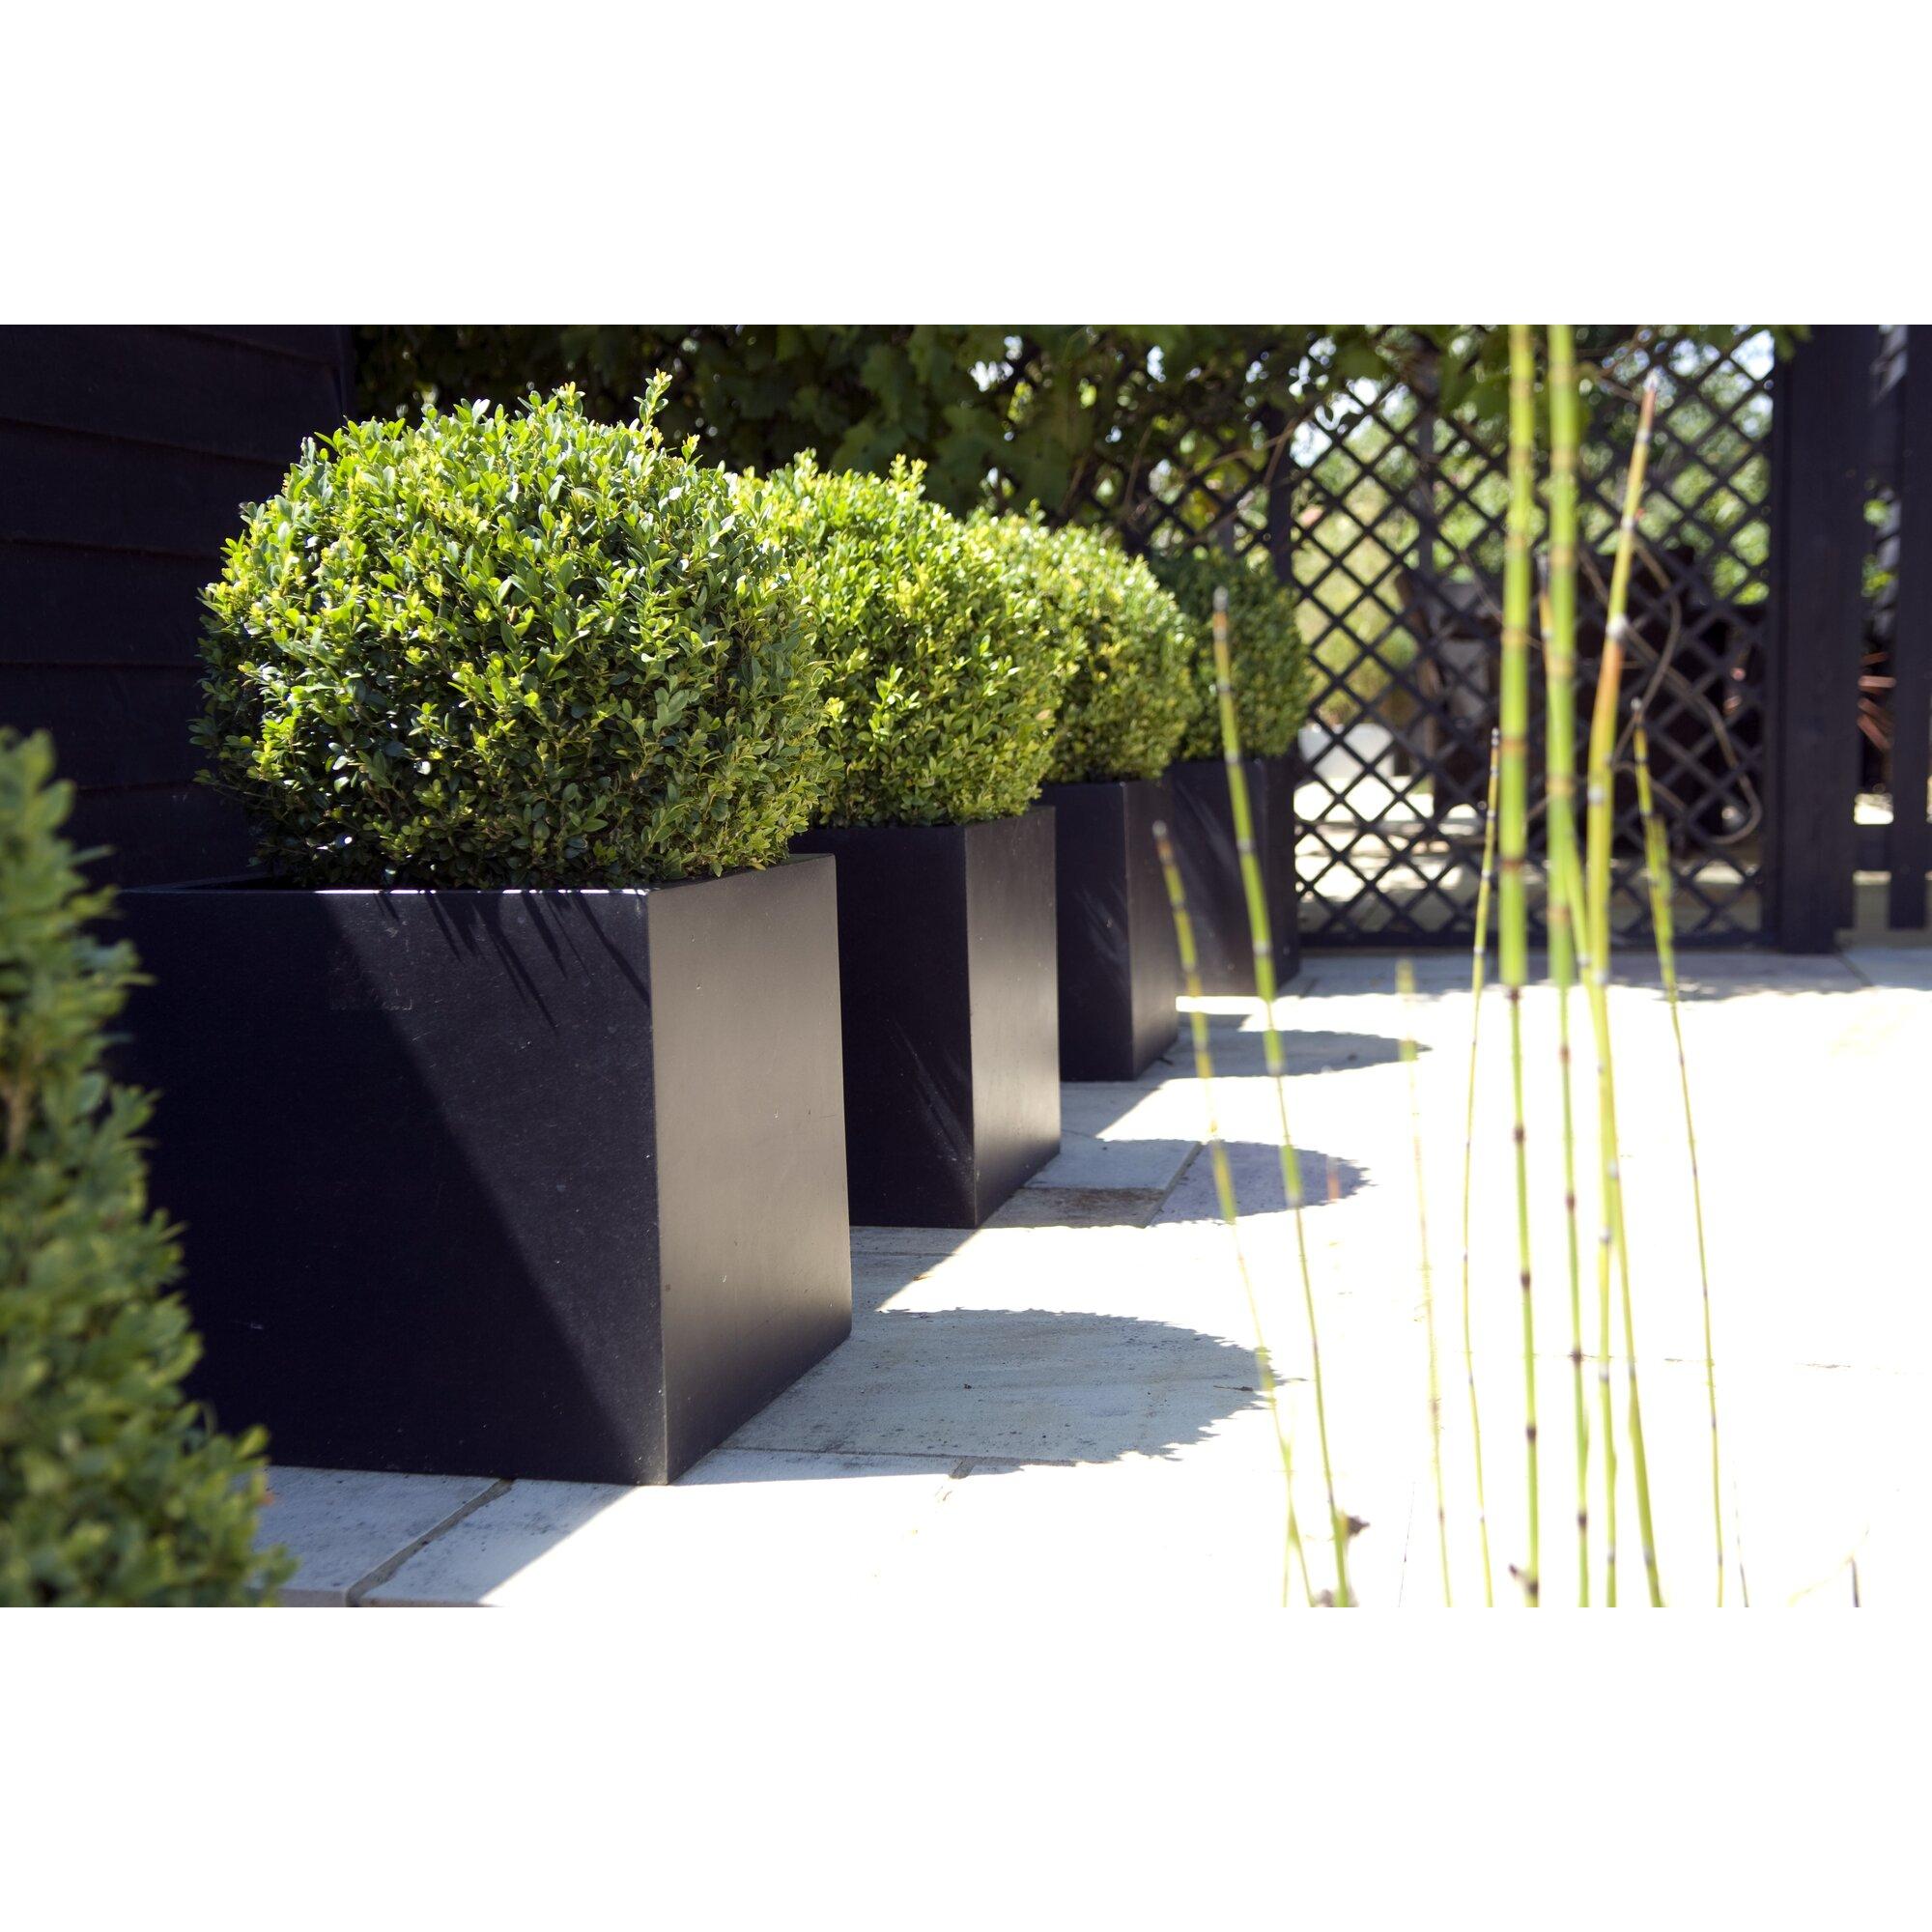 Garten living quadratischer pflanzkasten osage for Gartengestaltung quadratischer garten